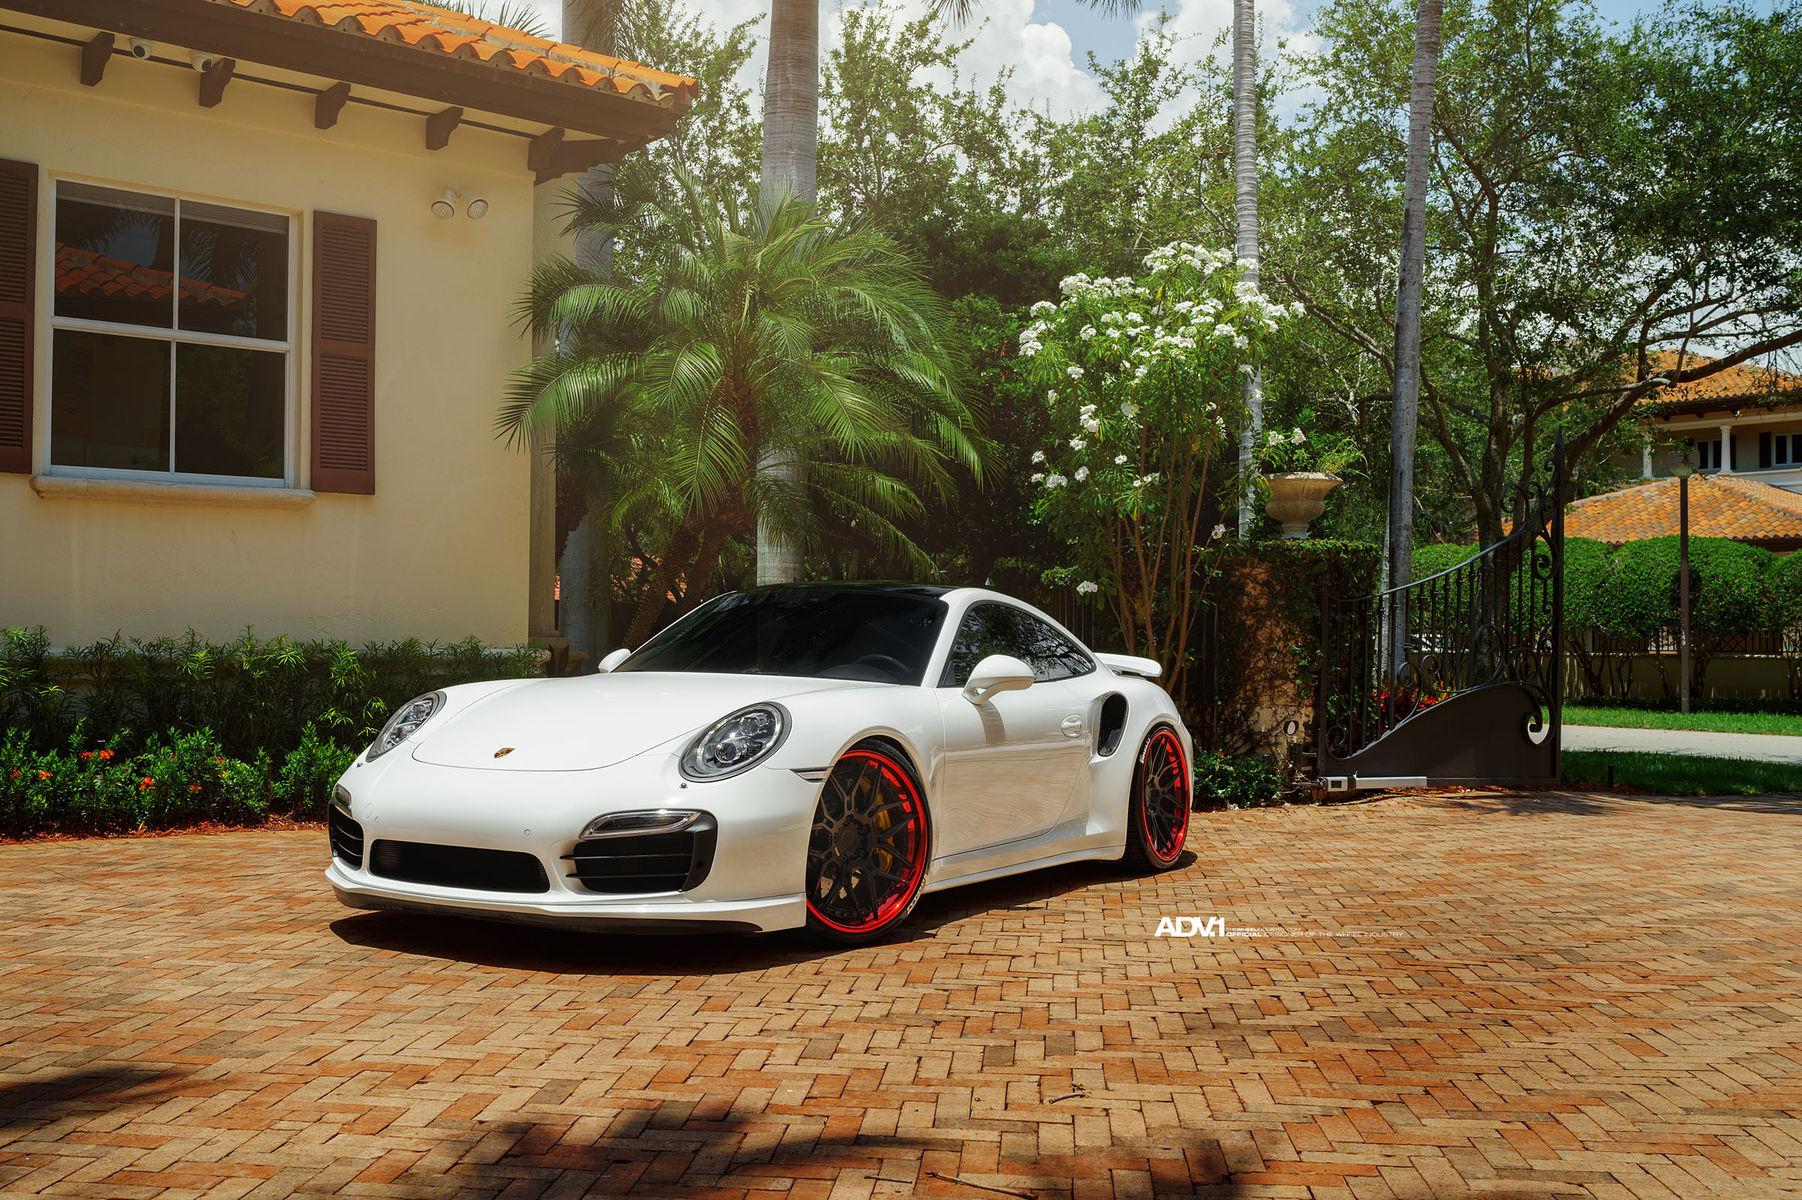 2015 Porsche 911 | Porsche 991 Turbo S